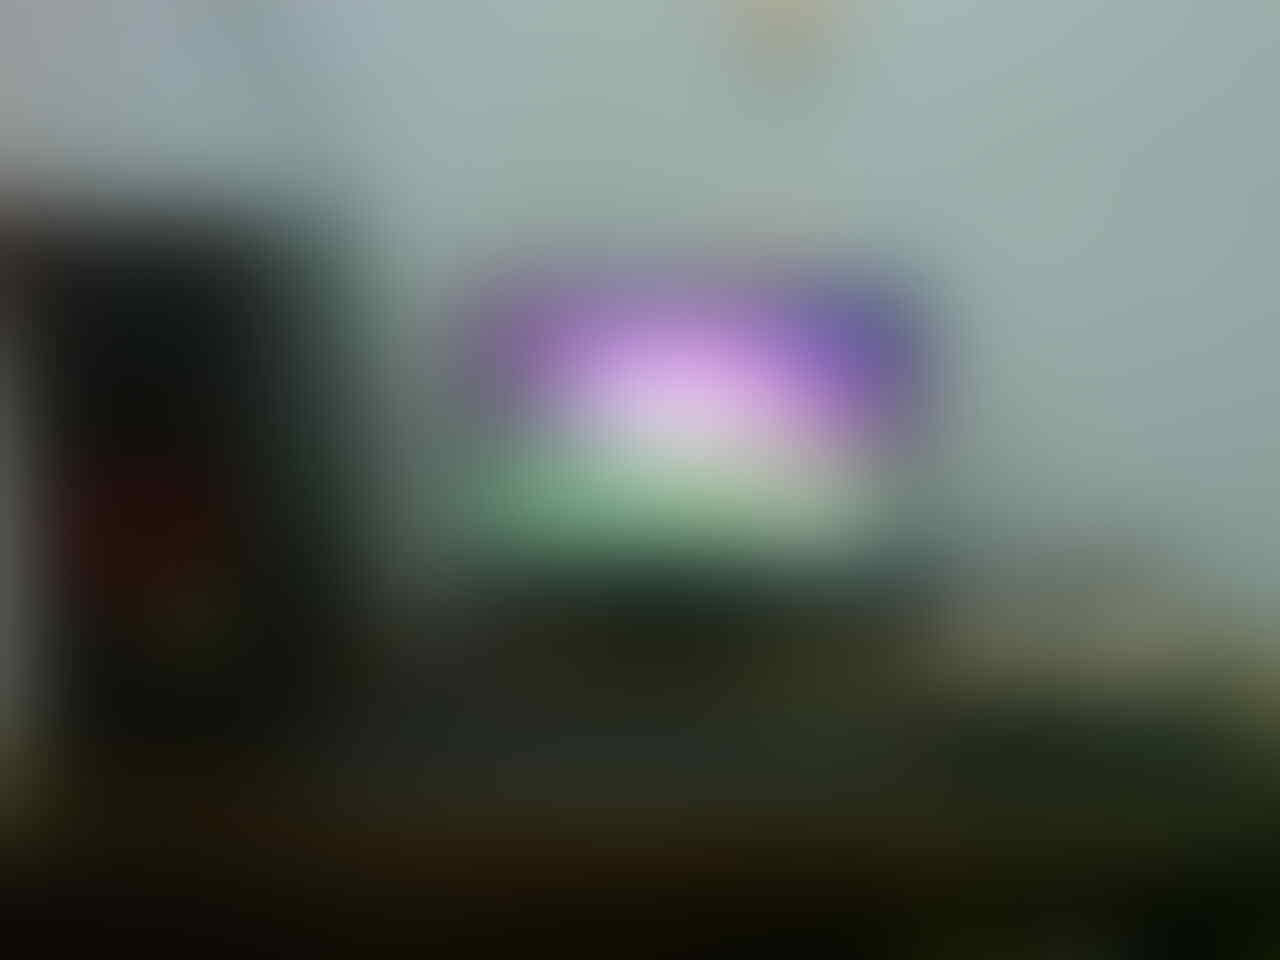 CPU, MONITOR, KEYBOARD, MOUSE, TV TUNNER